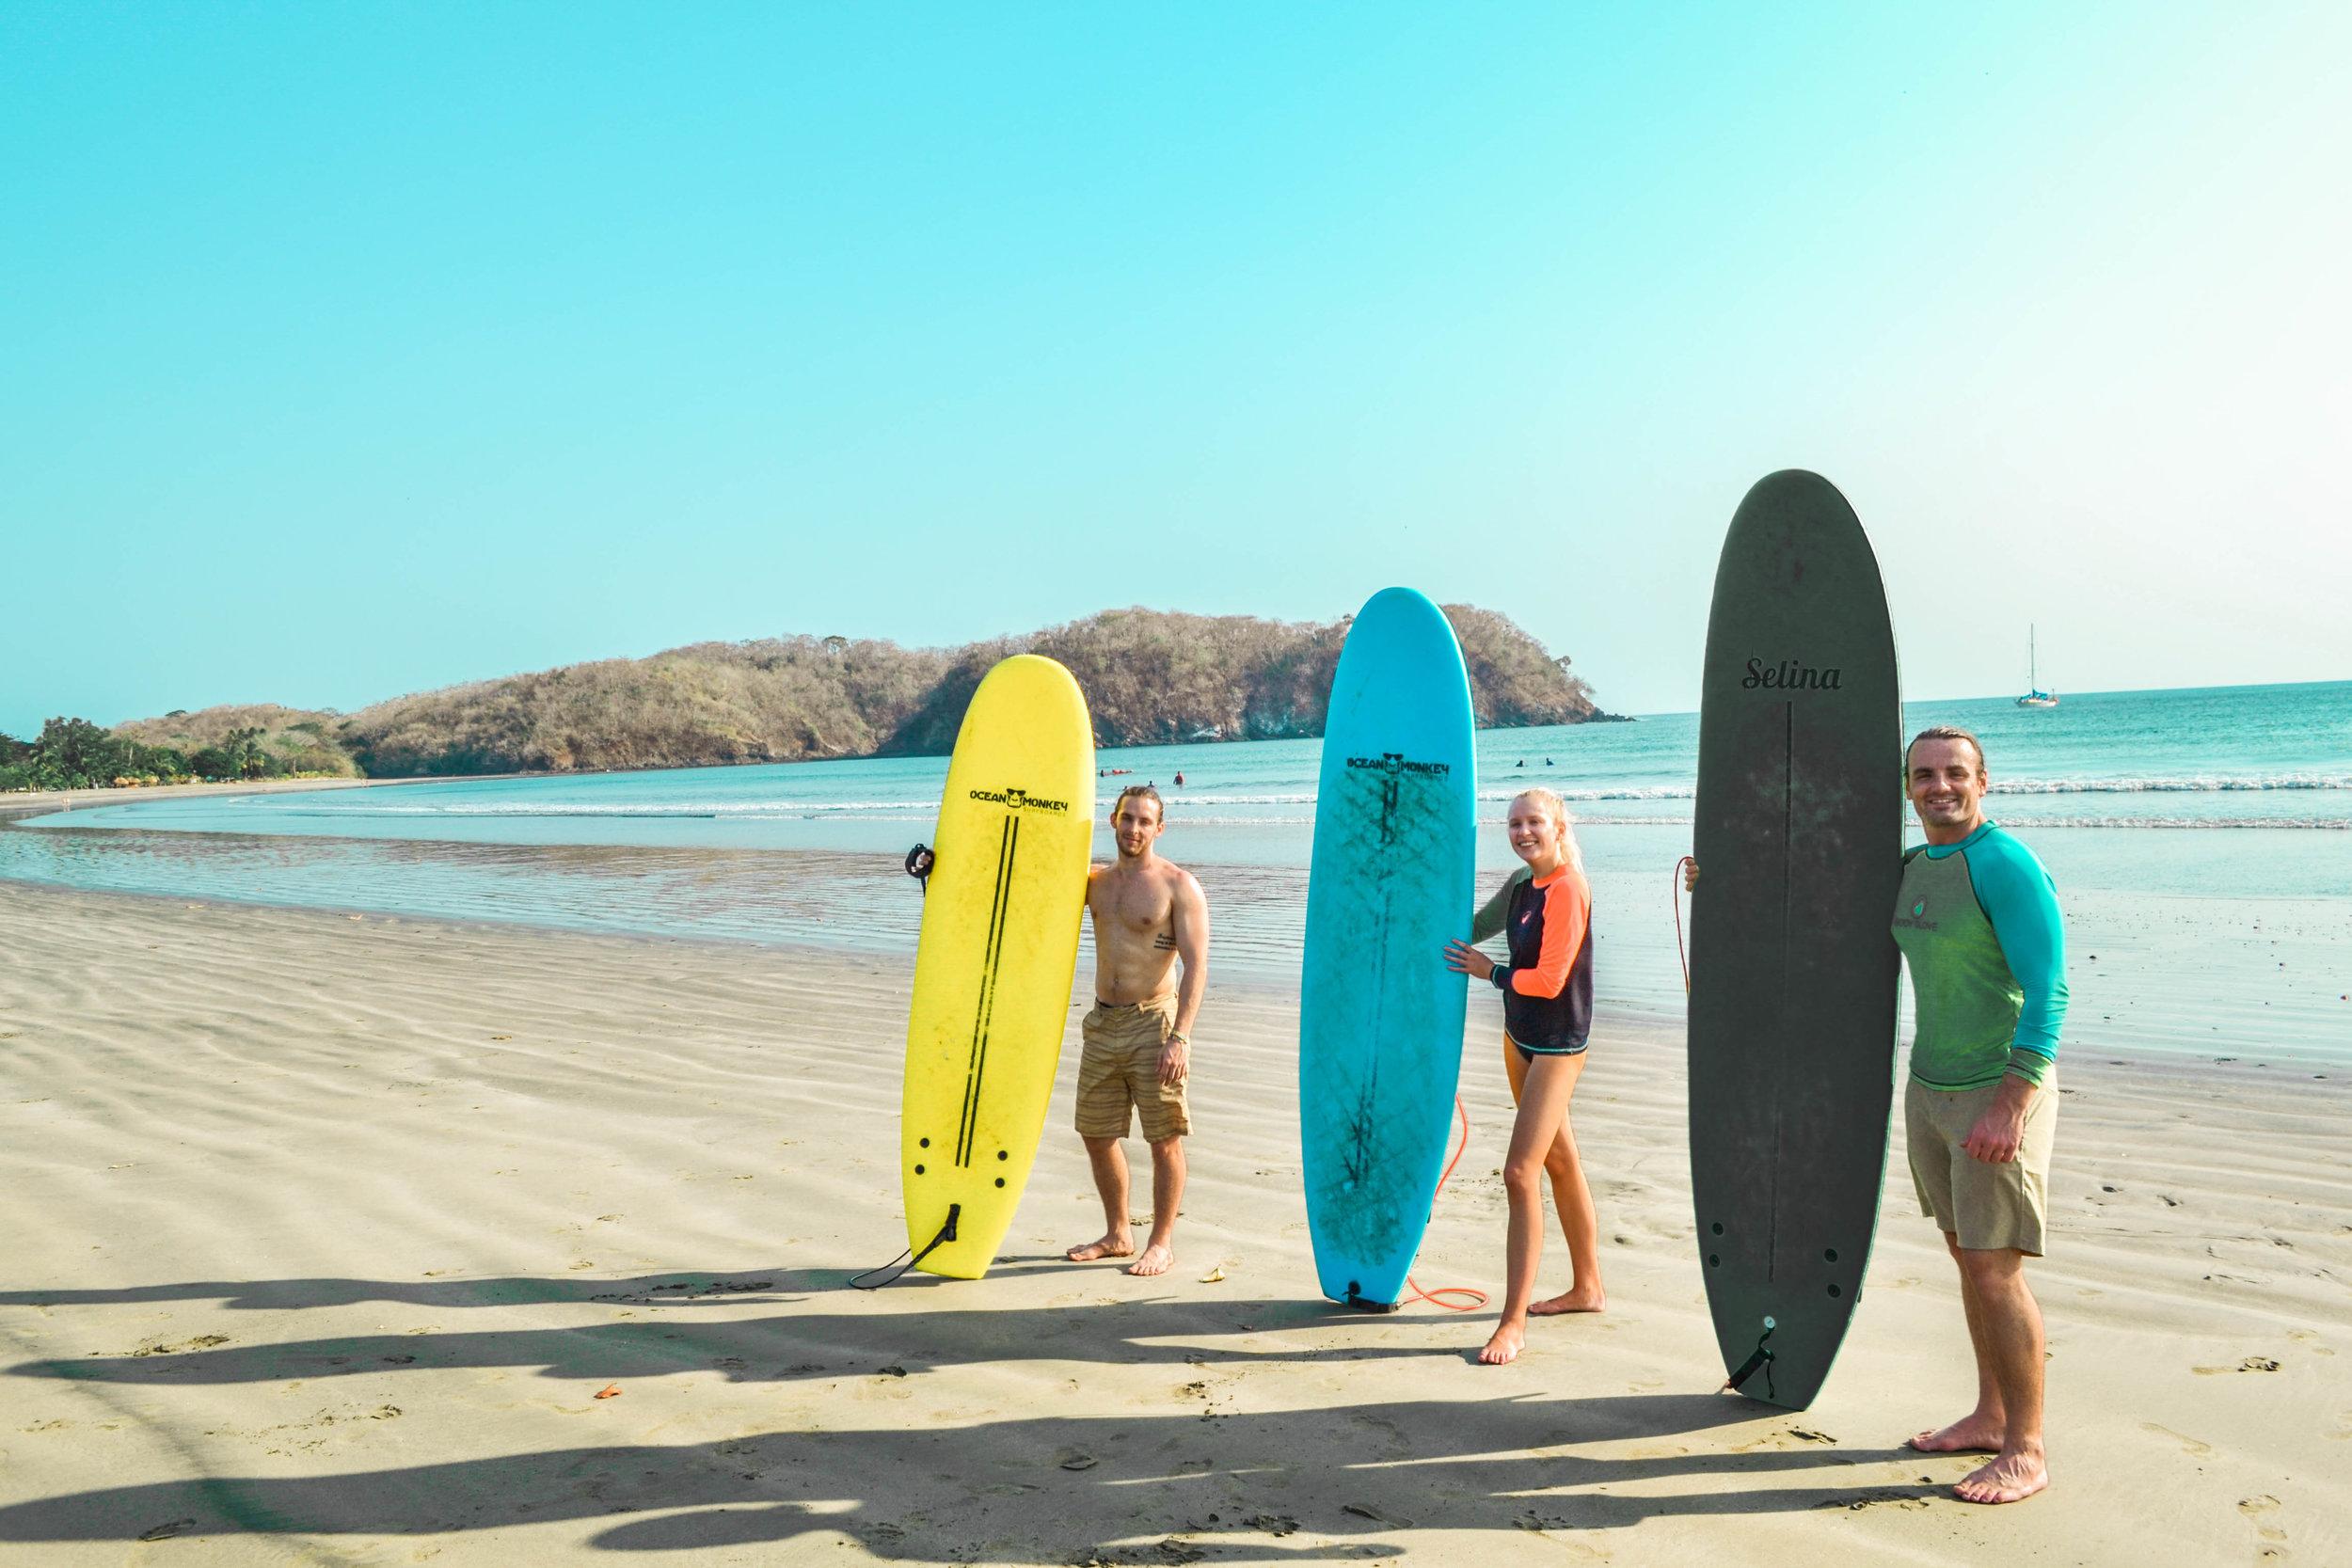 Surfing in playa venao